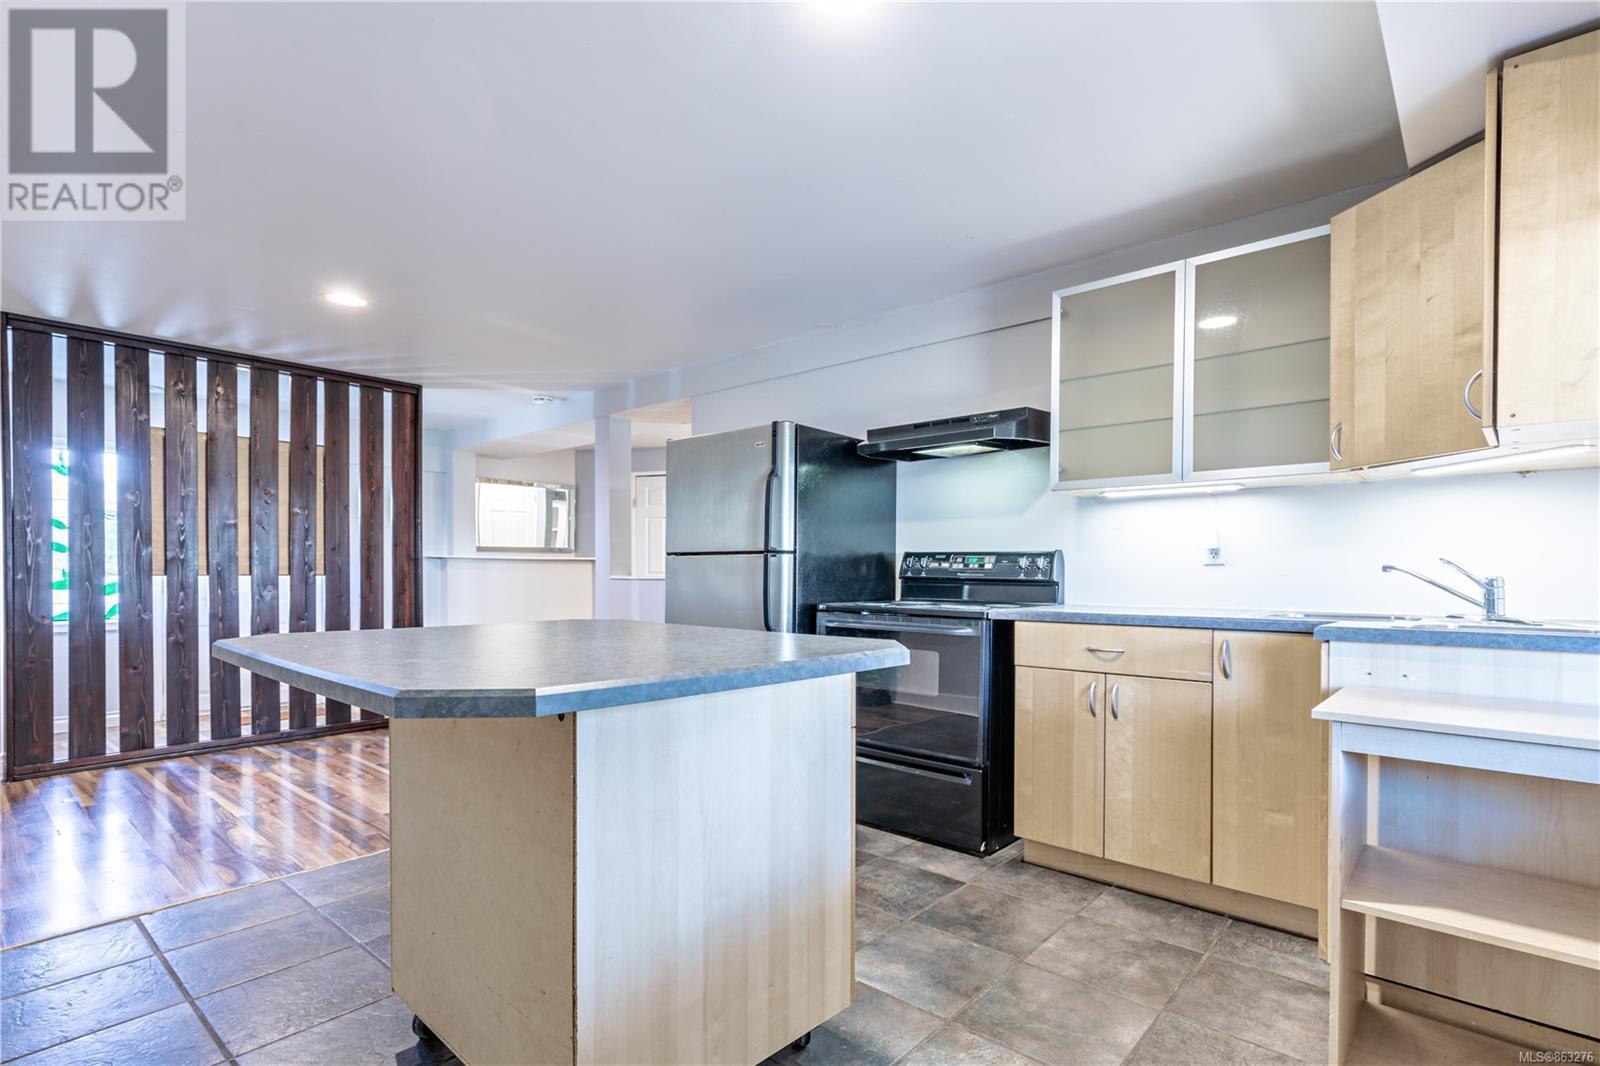 673 Winchester Ave, Nanaimo, British Columbia  V9R 4B6 - Photo 5 - 863276